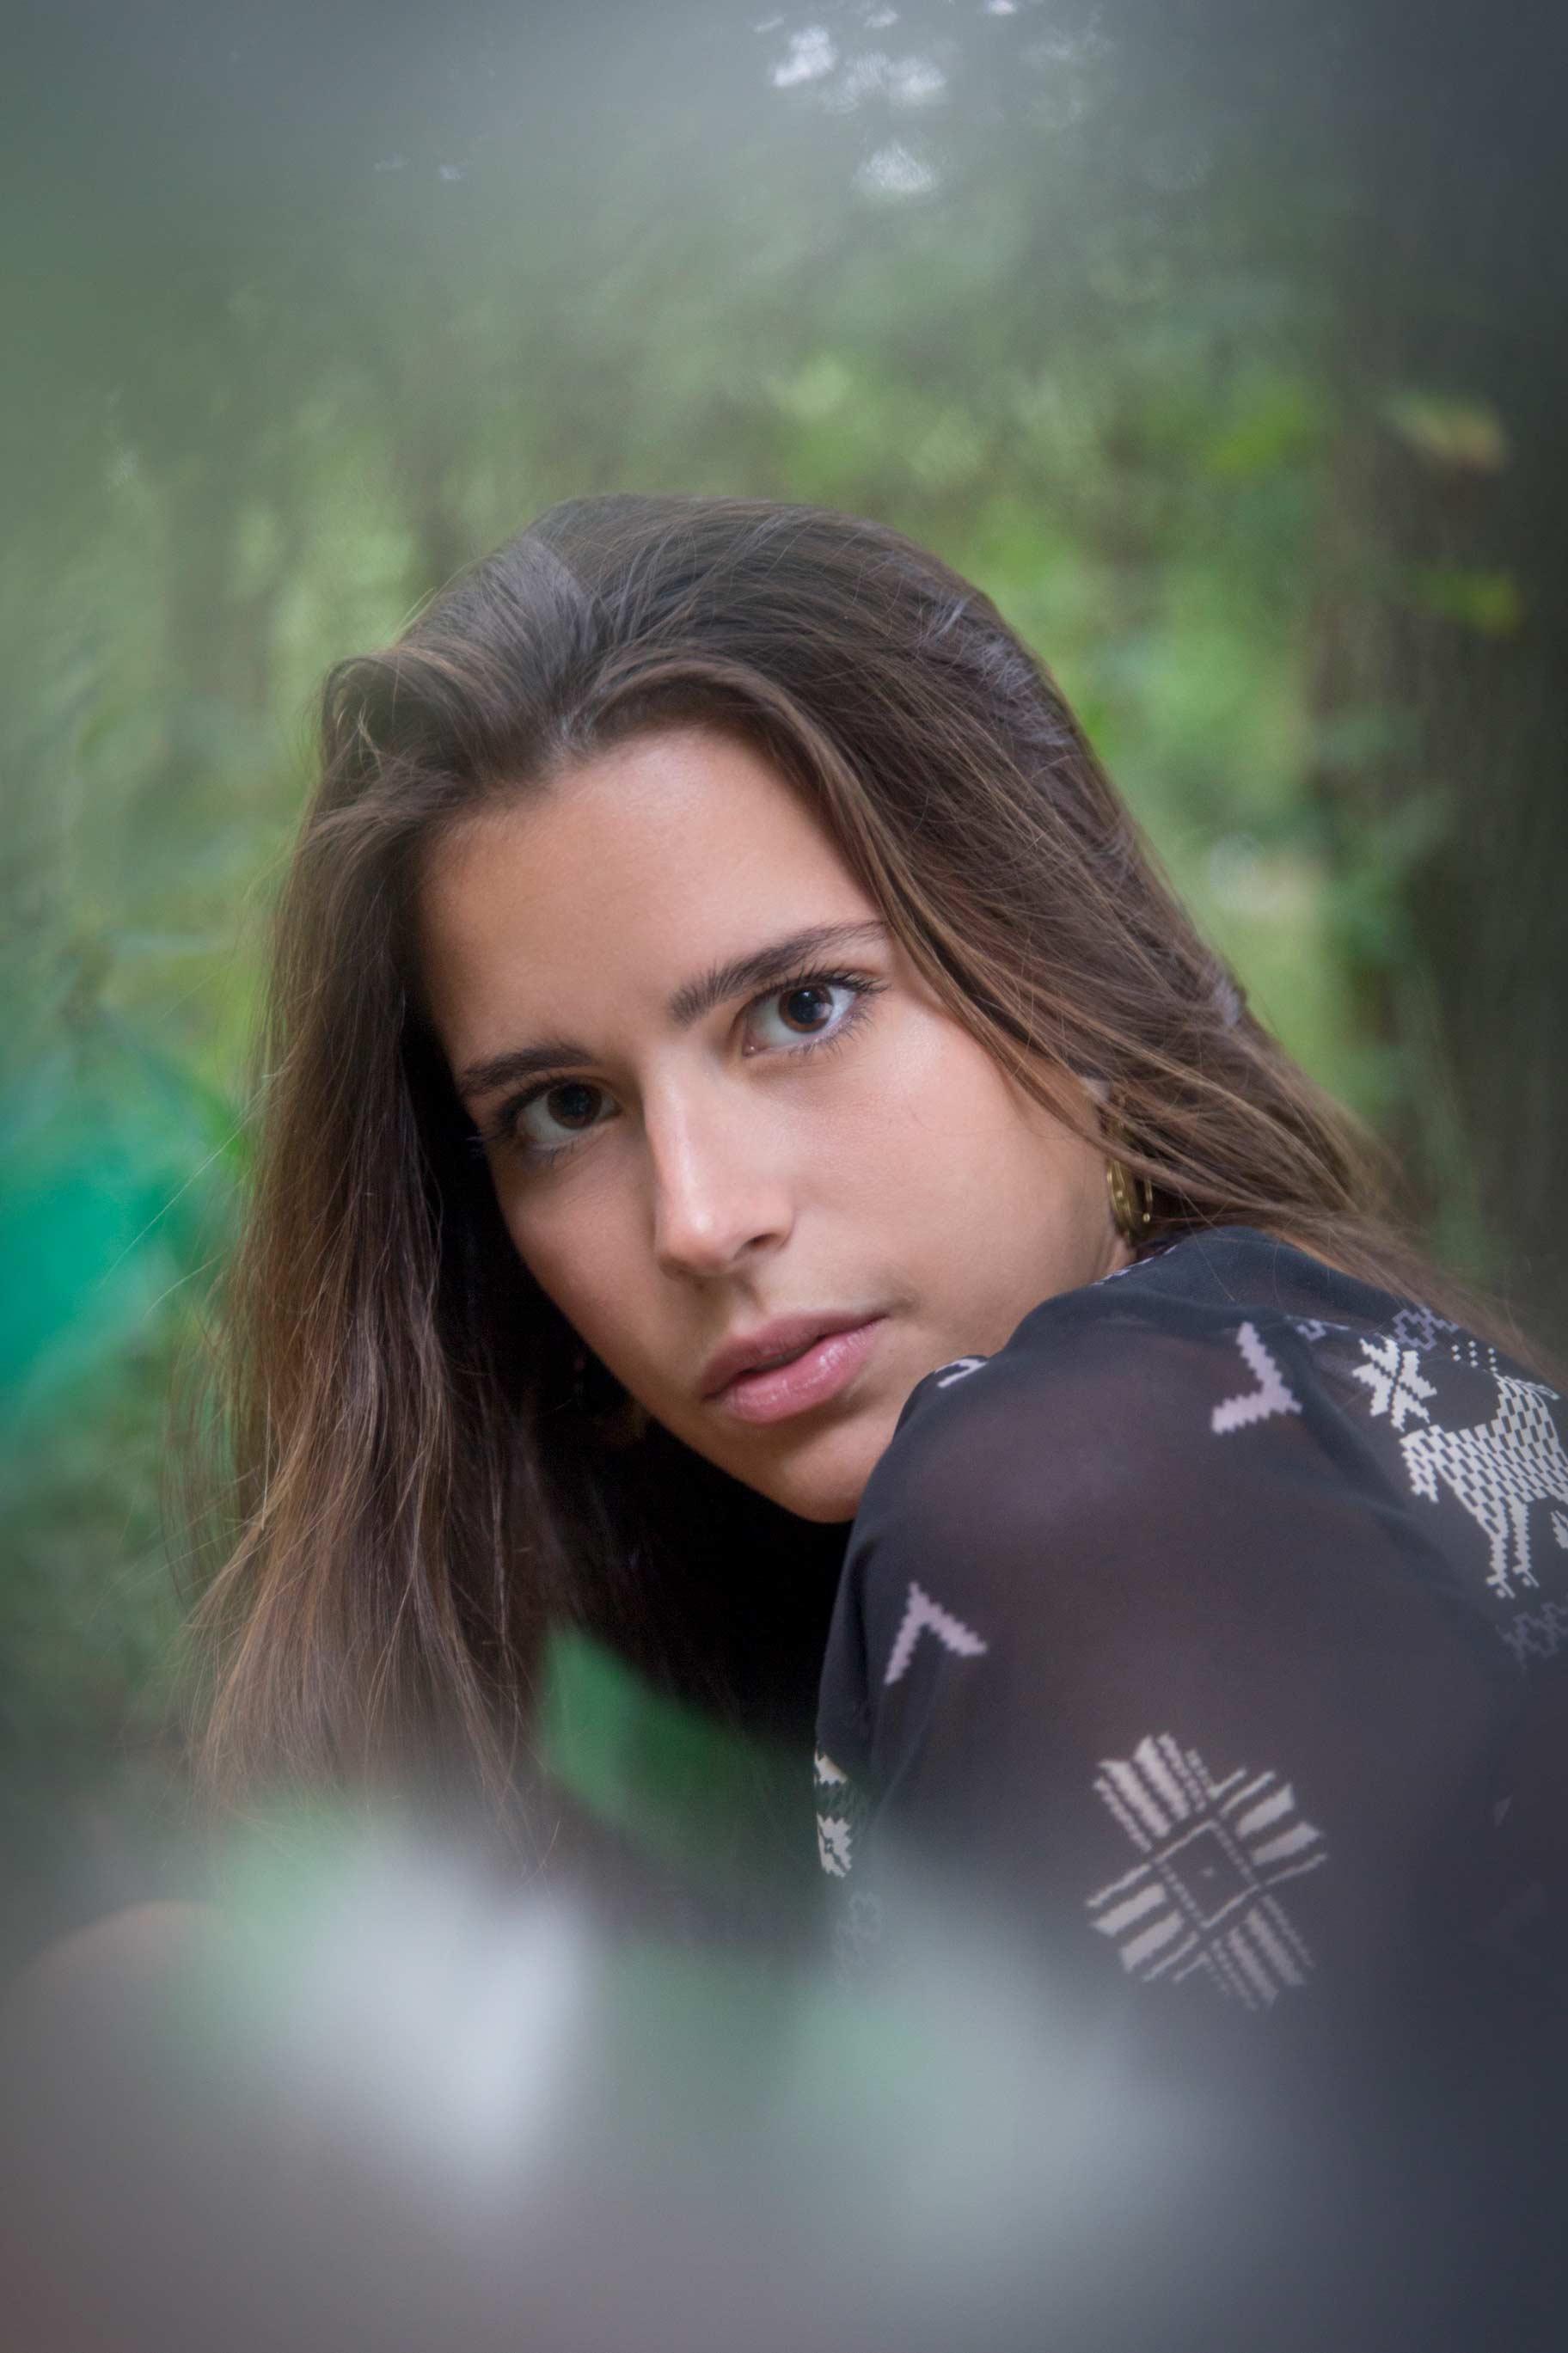 Ines-Aramburo-photographe-paris-portrait-lifestyle-seance-photo-photoshoot-photographer33.jpg